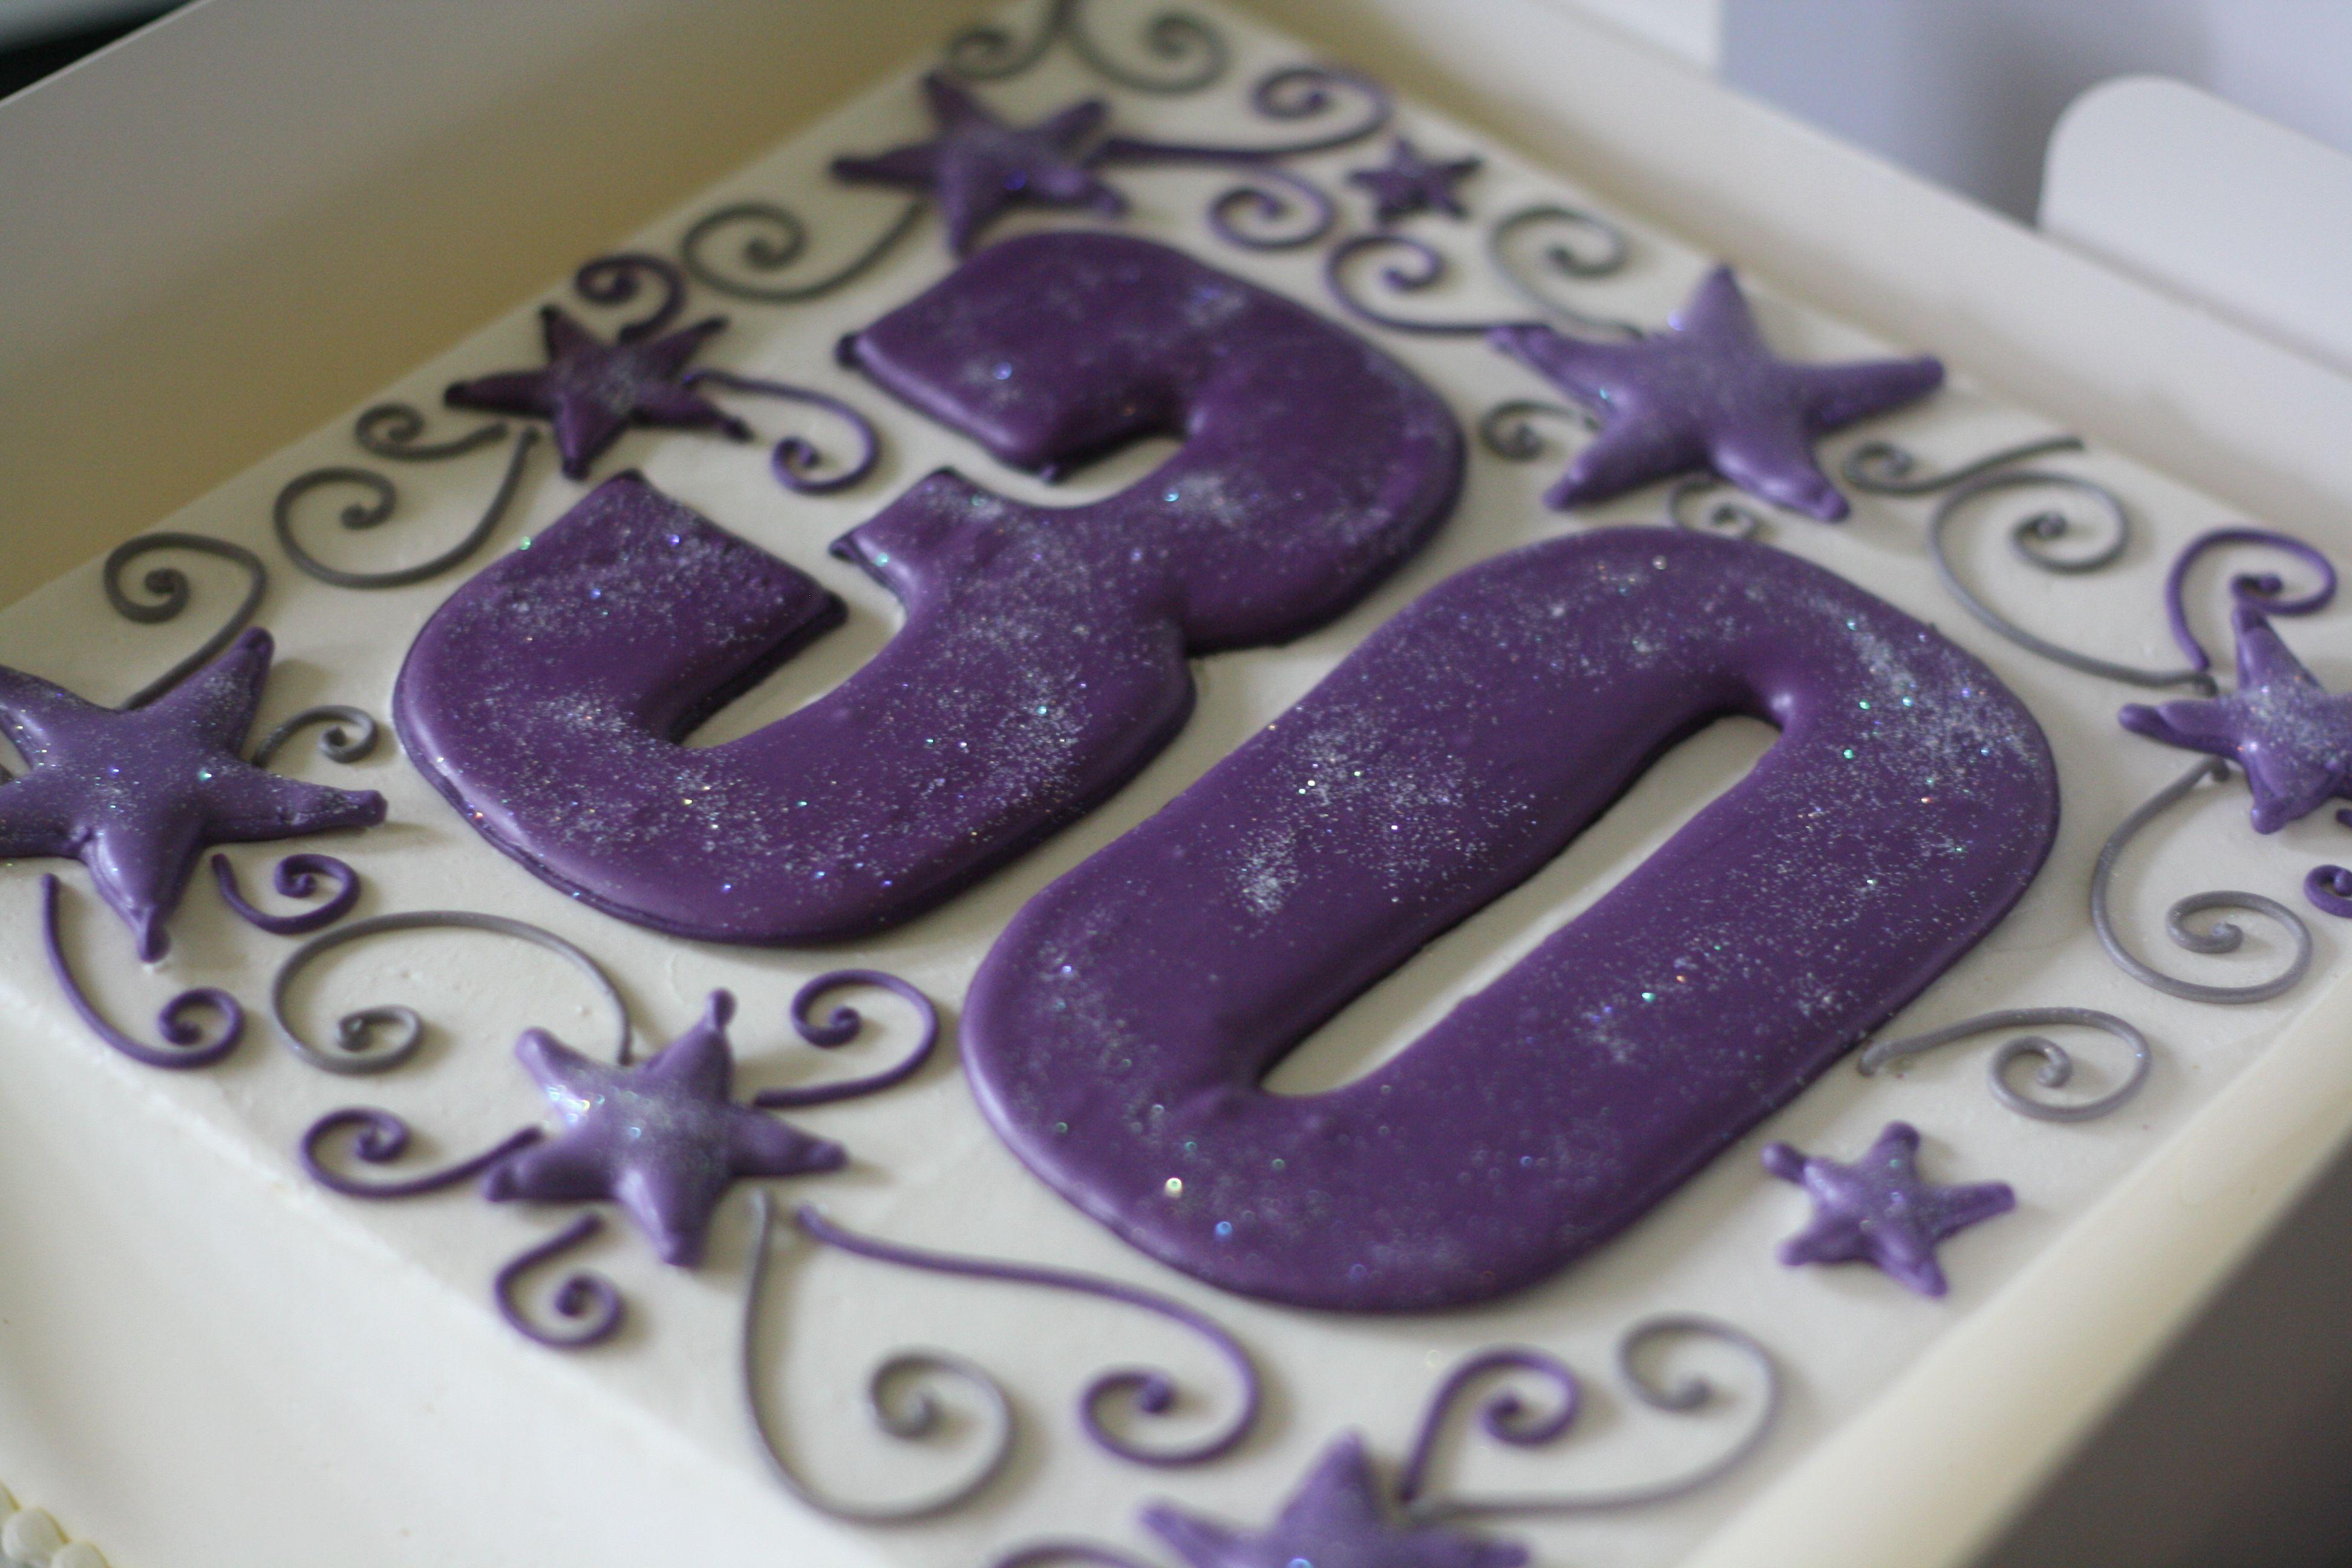 12 Purple 30th Birthday Cakes For Women Photo Black And Purple 30th Birthday Cake For Women Cakes For Women 30 Birthday Cake